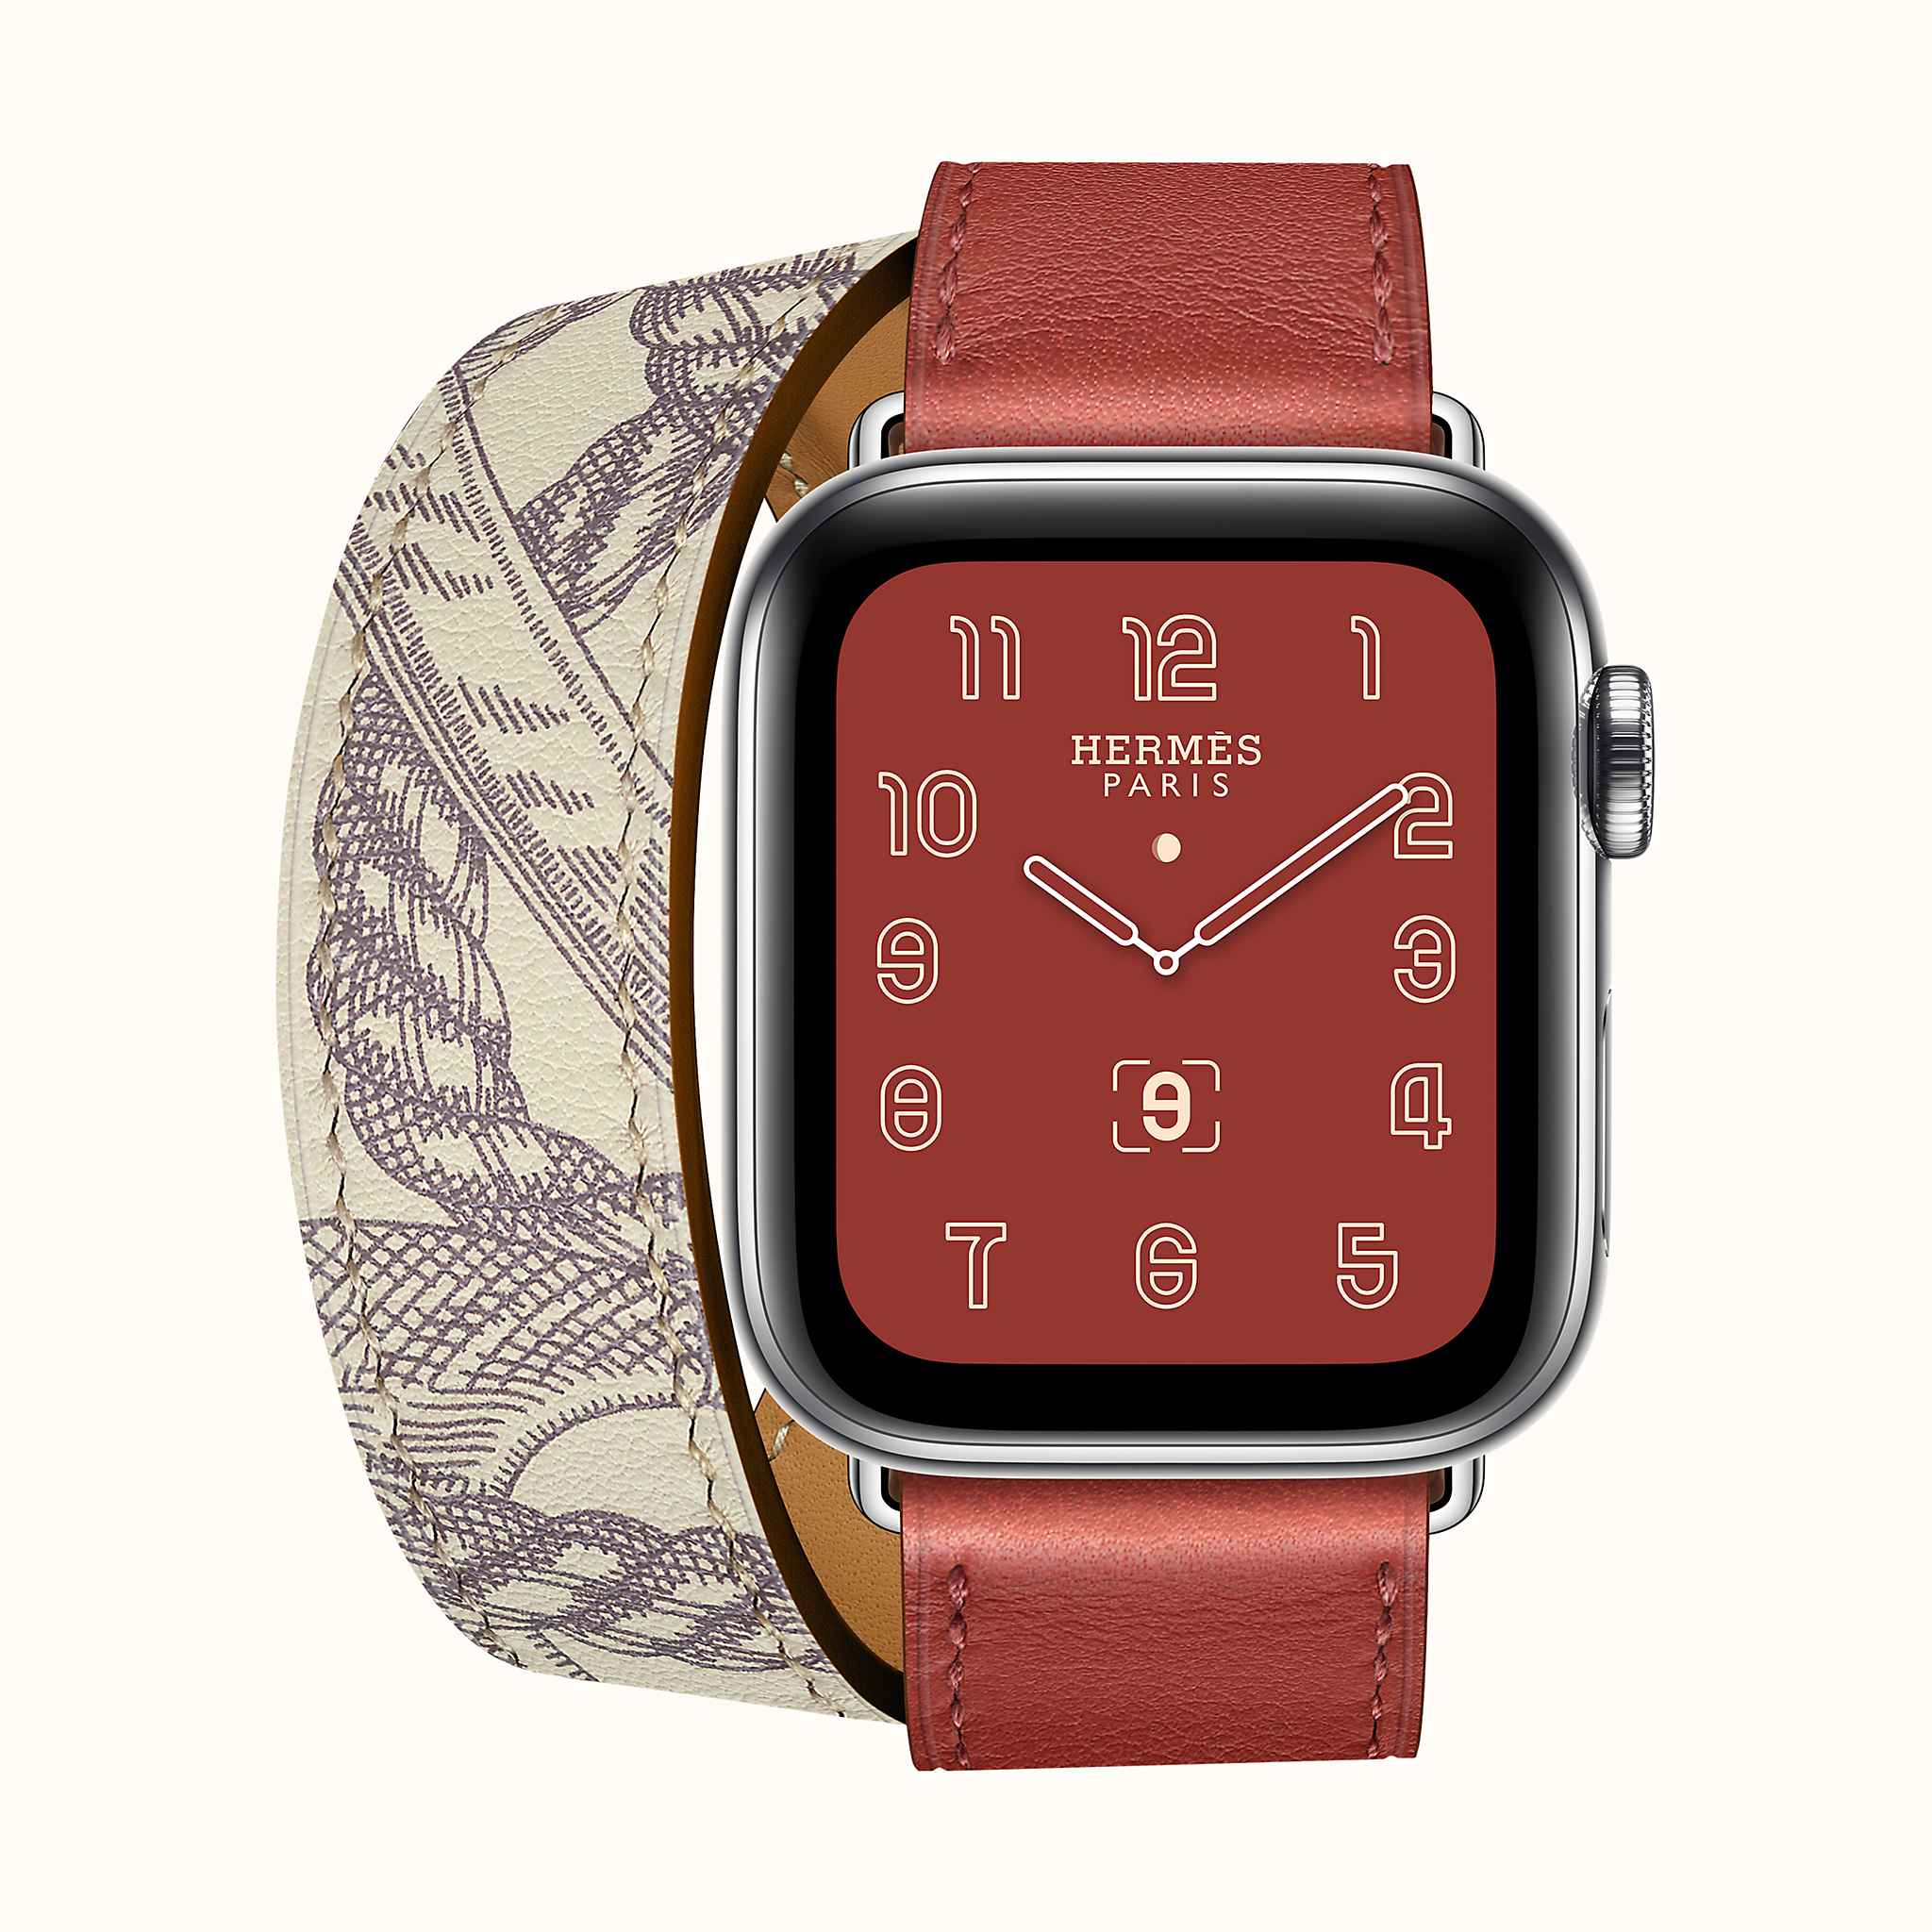 BOITIER AWH S5 INOX 40MM WORLD WIDE \u0026 Bracelet Apple Watch Hermès Double  Tour 40 mm